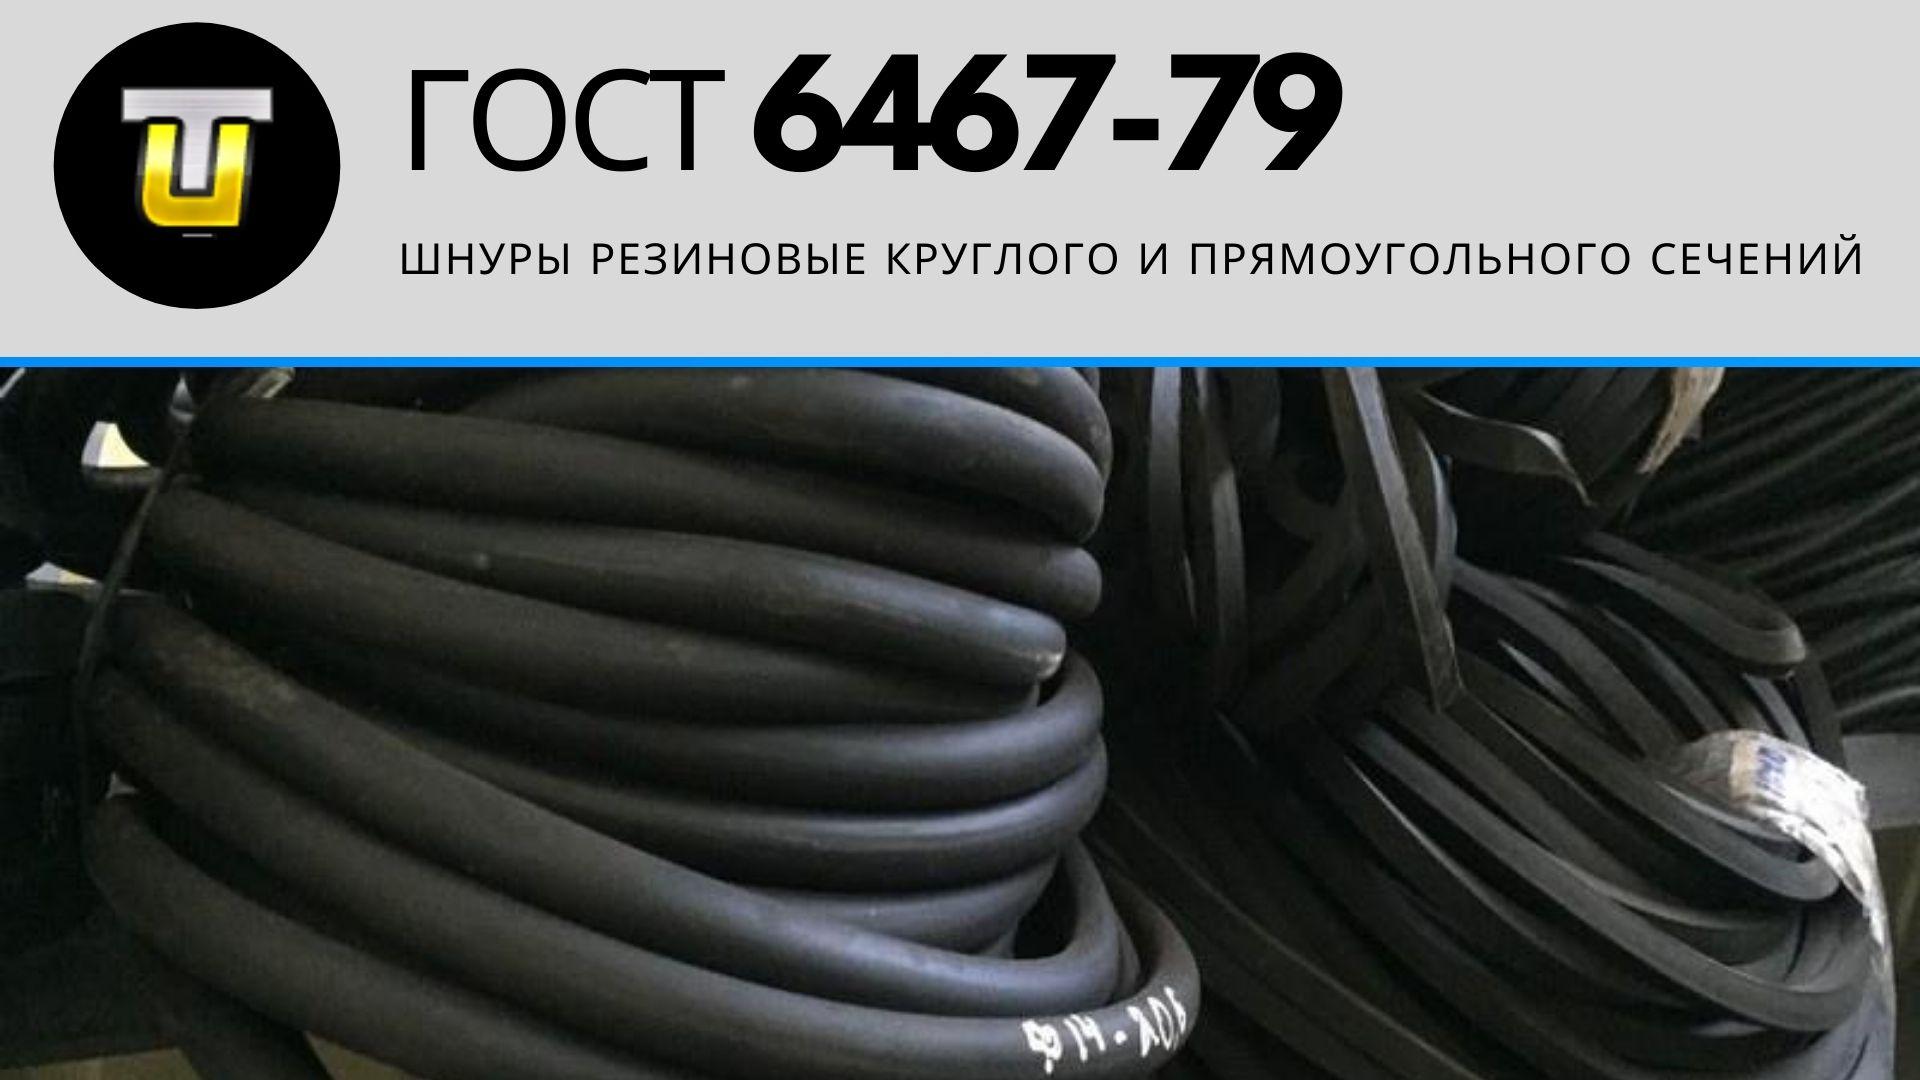 ГОСТ 6467-79